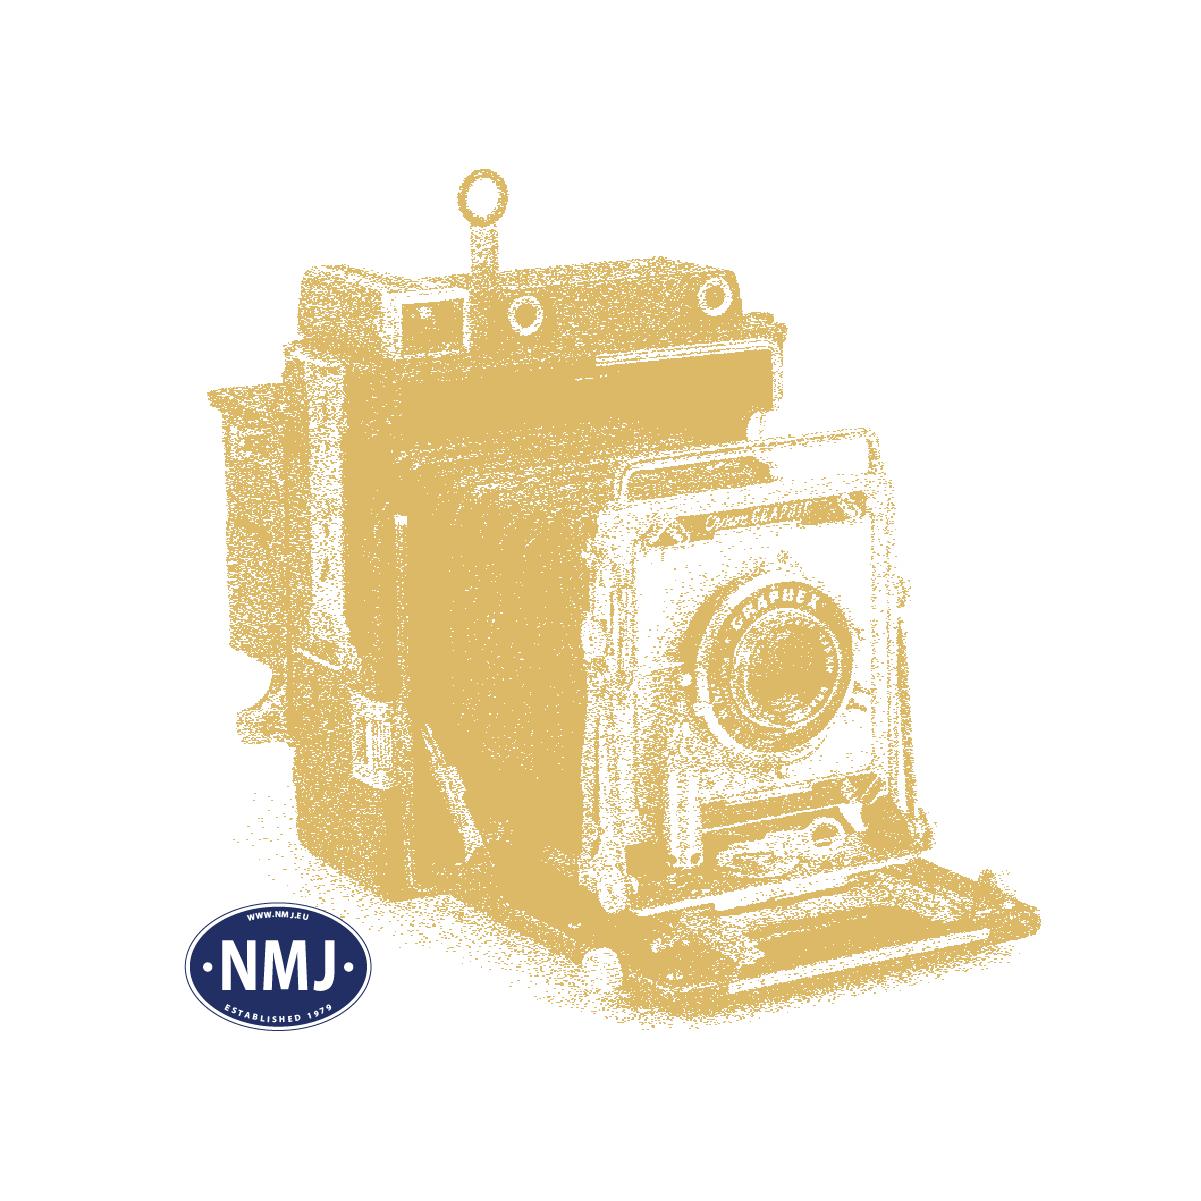 NMJT90011 - NMJ Topline NSB Di3a 617, Gammeldesign, DCC m/ Lyd